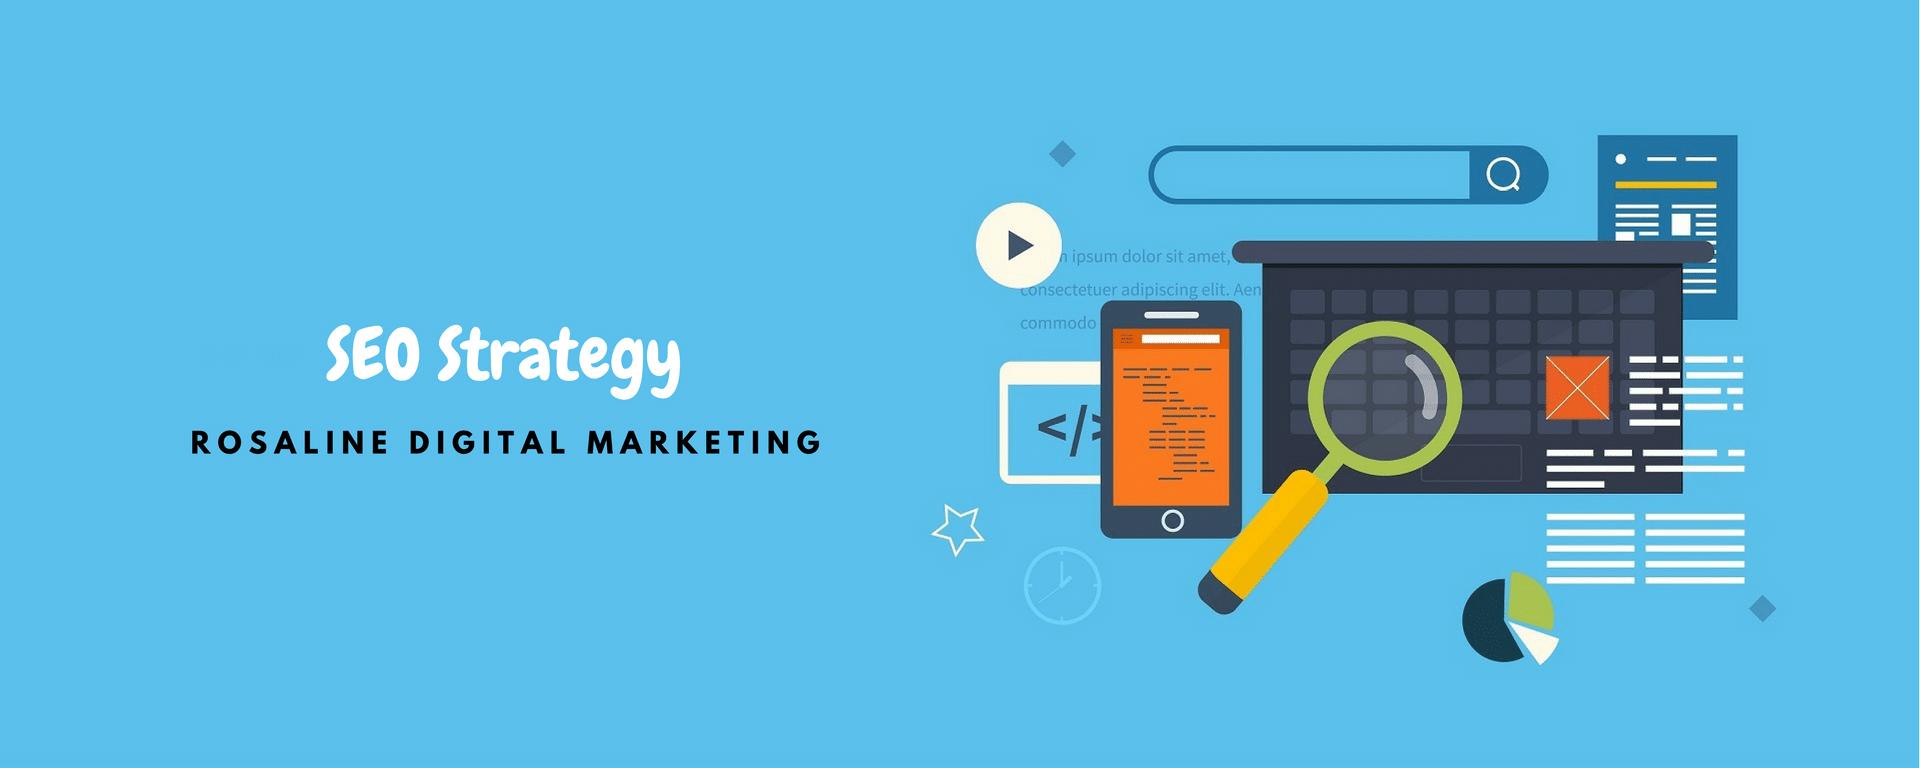 SEO Strategy - SEO Marketing Strategy